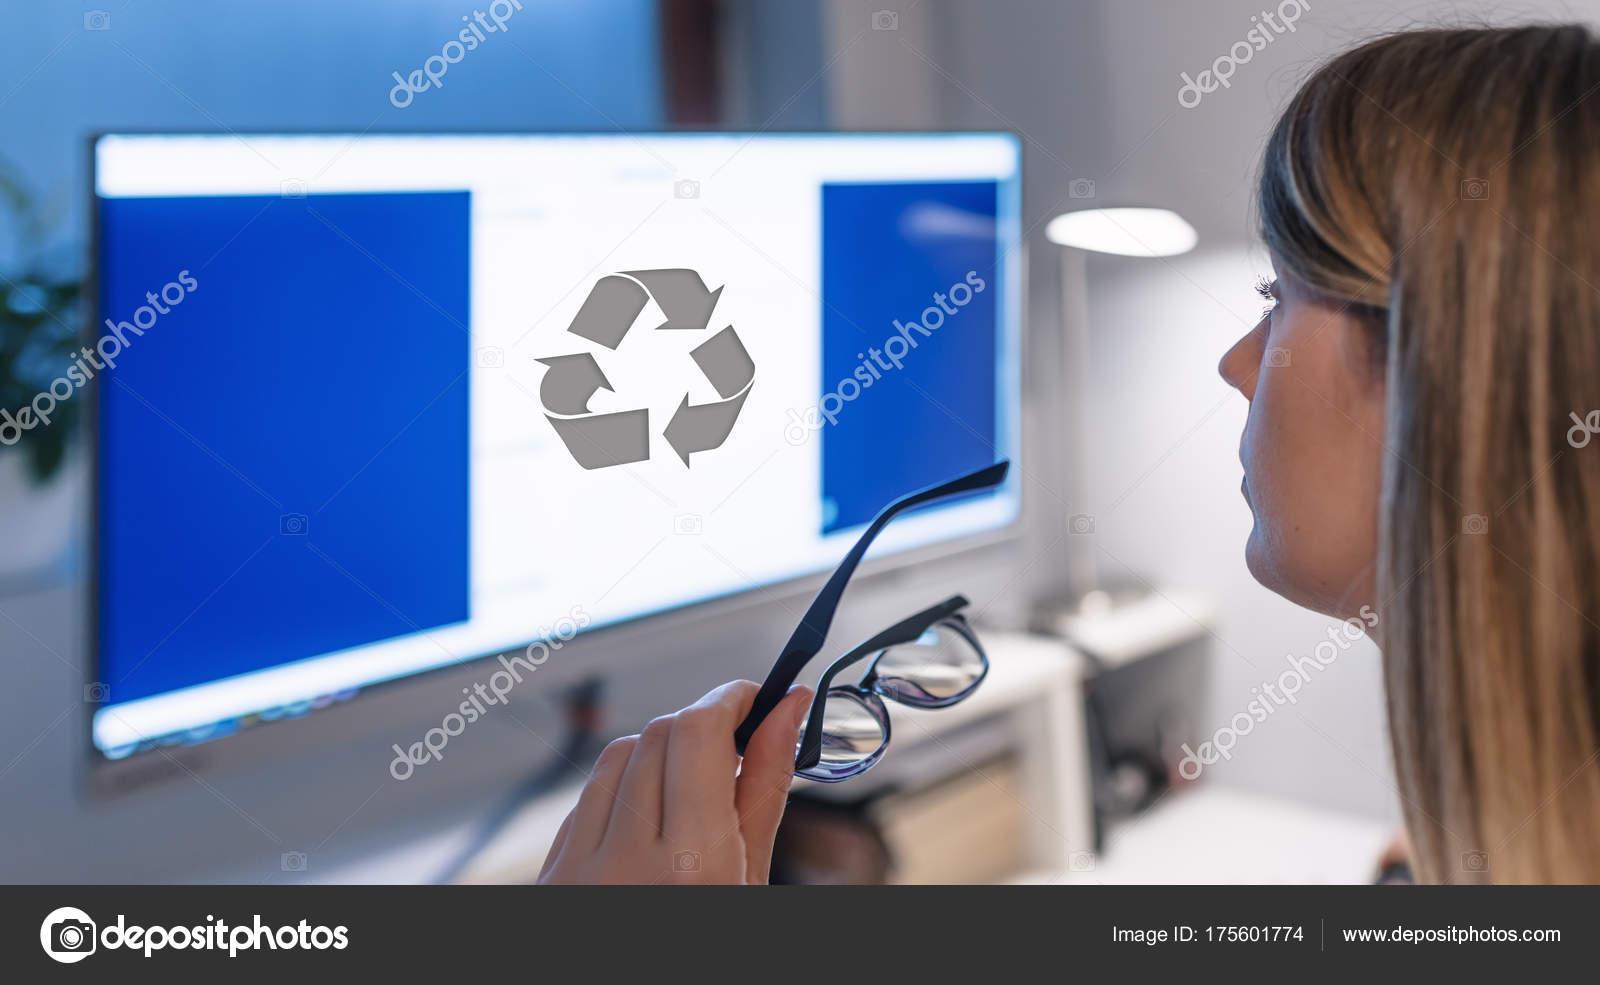 jeune femme dactylographie sur ordinateur bureau bureau table symbole recyclage photo